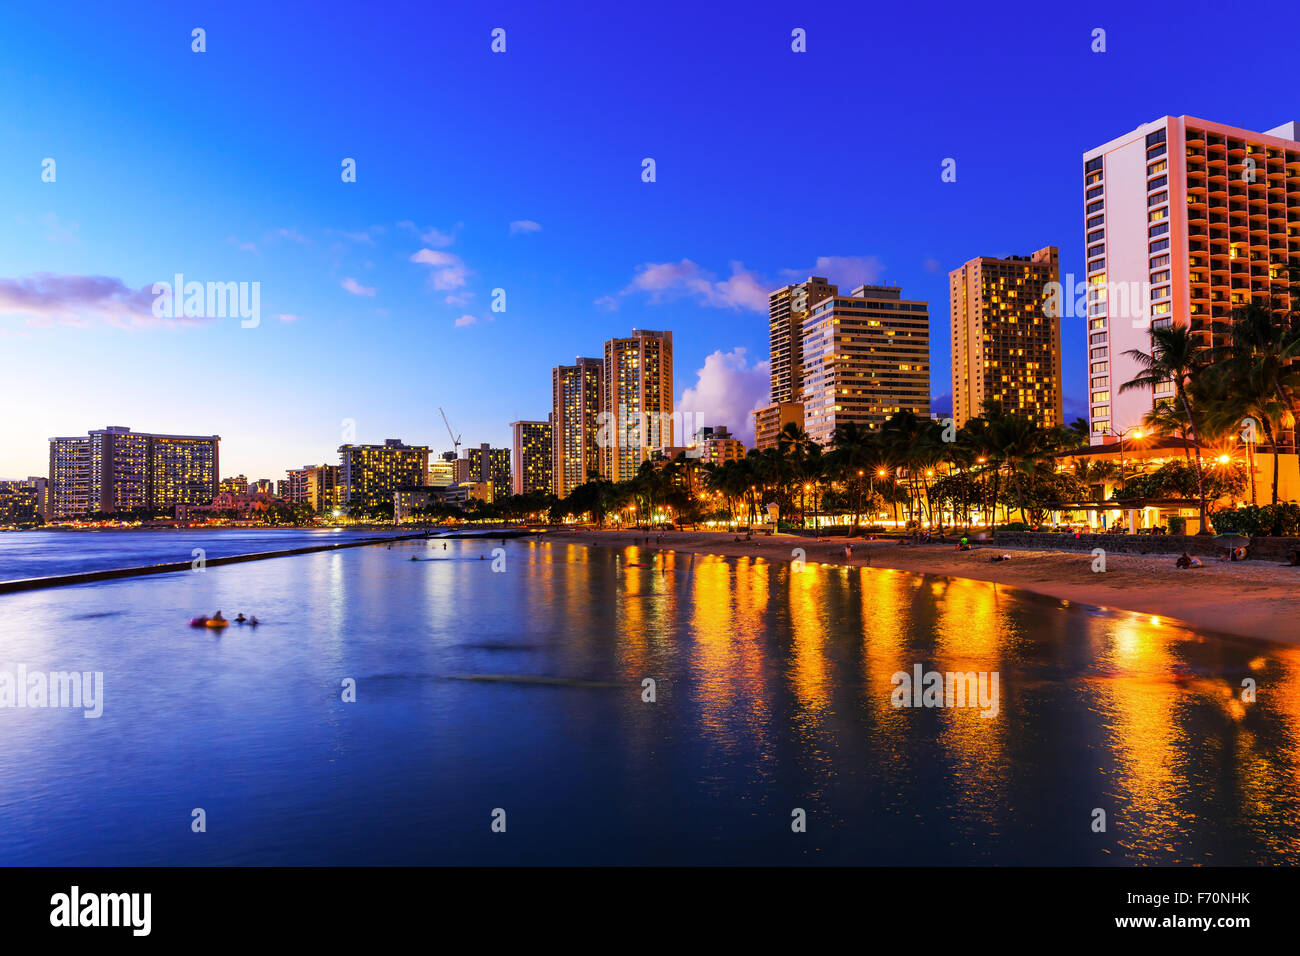 View of Honolulu and Waikiki Beach at night; Hawaii, USA - Stock Image